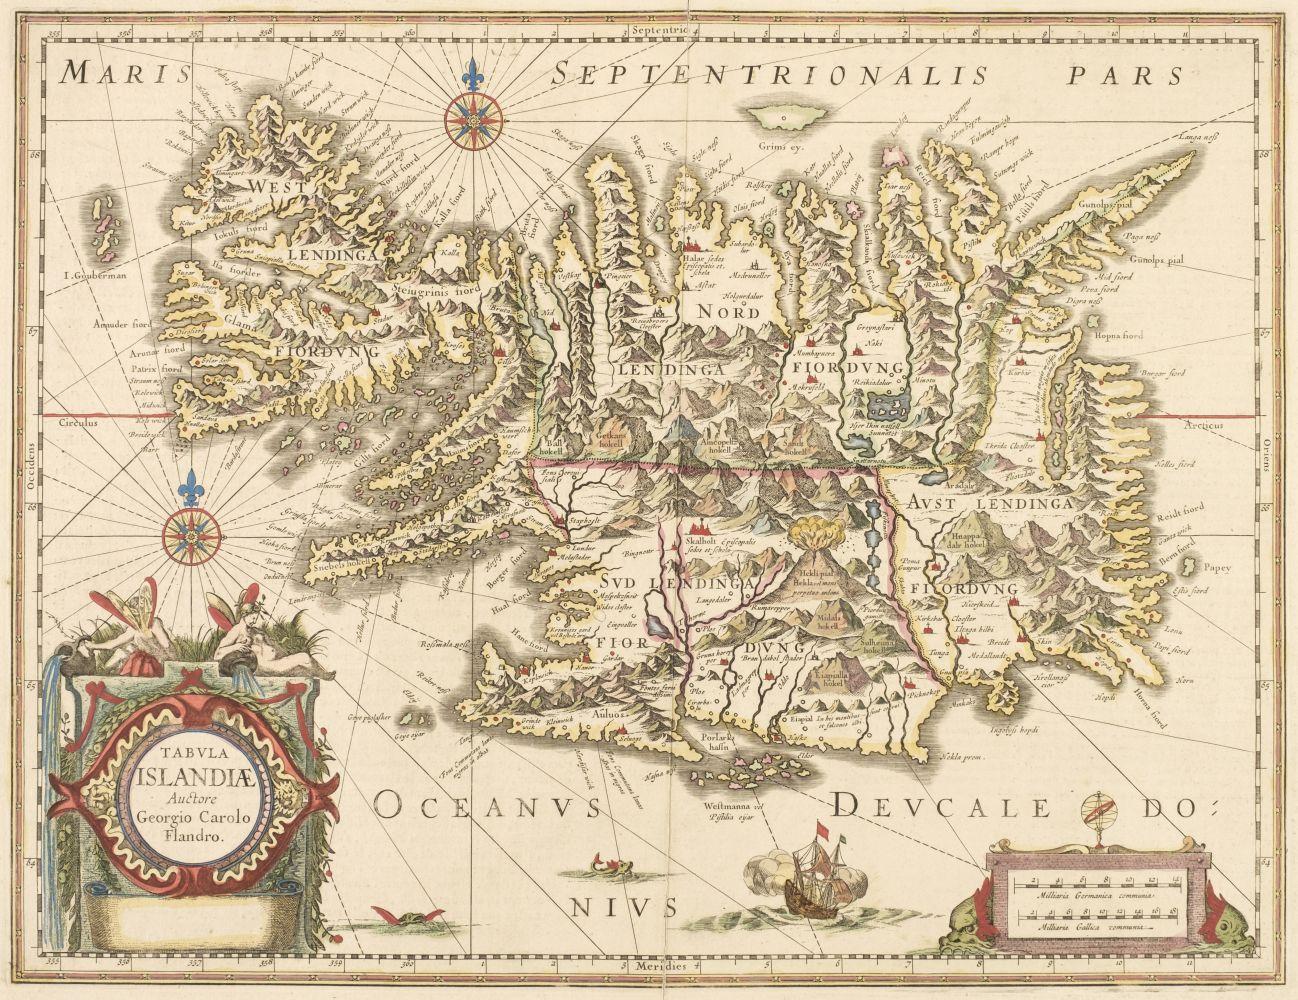 Iceland. Jansson (Jan), Tabula Islandiae Auctore Georgio Carolo Flandro, circa 1650